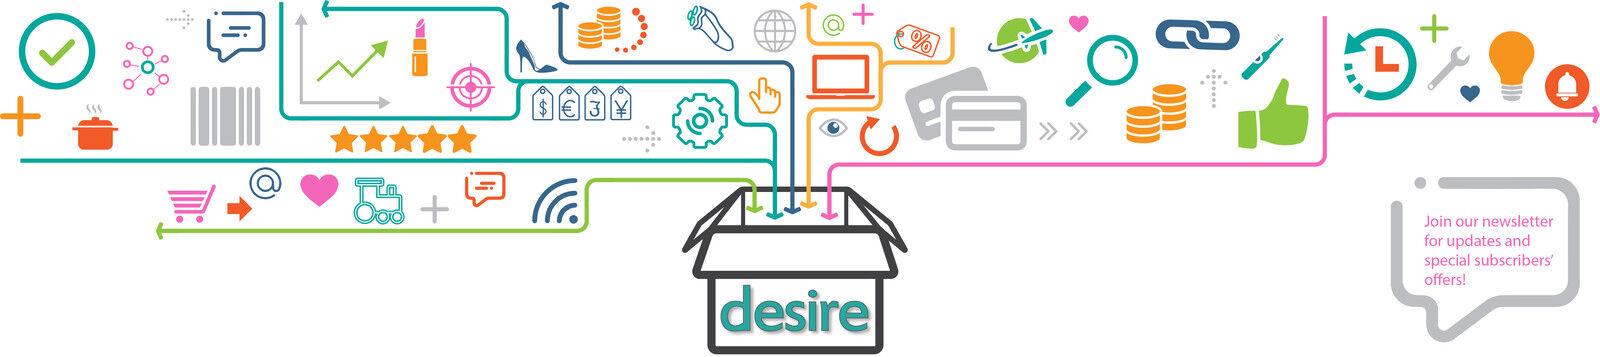 desirebox